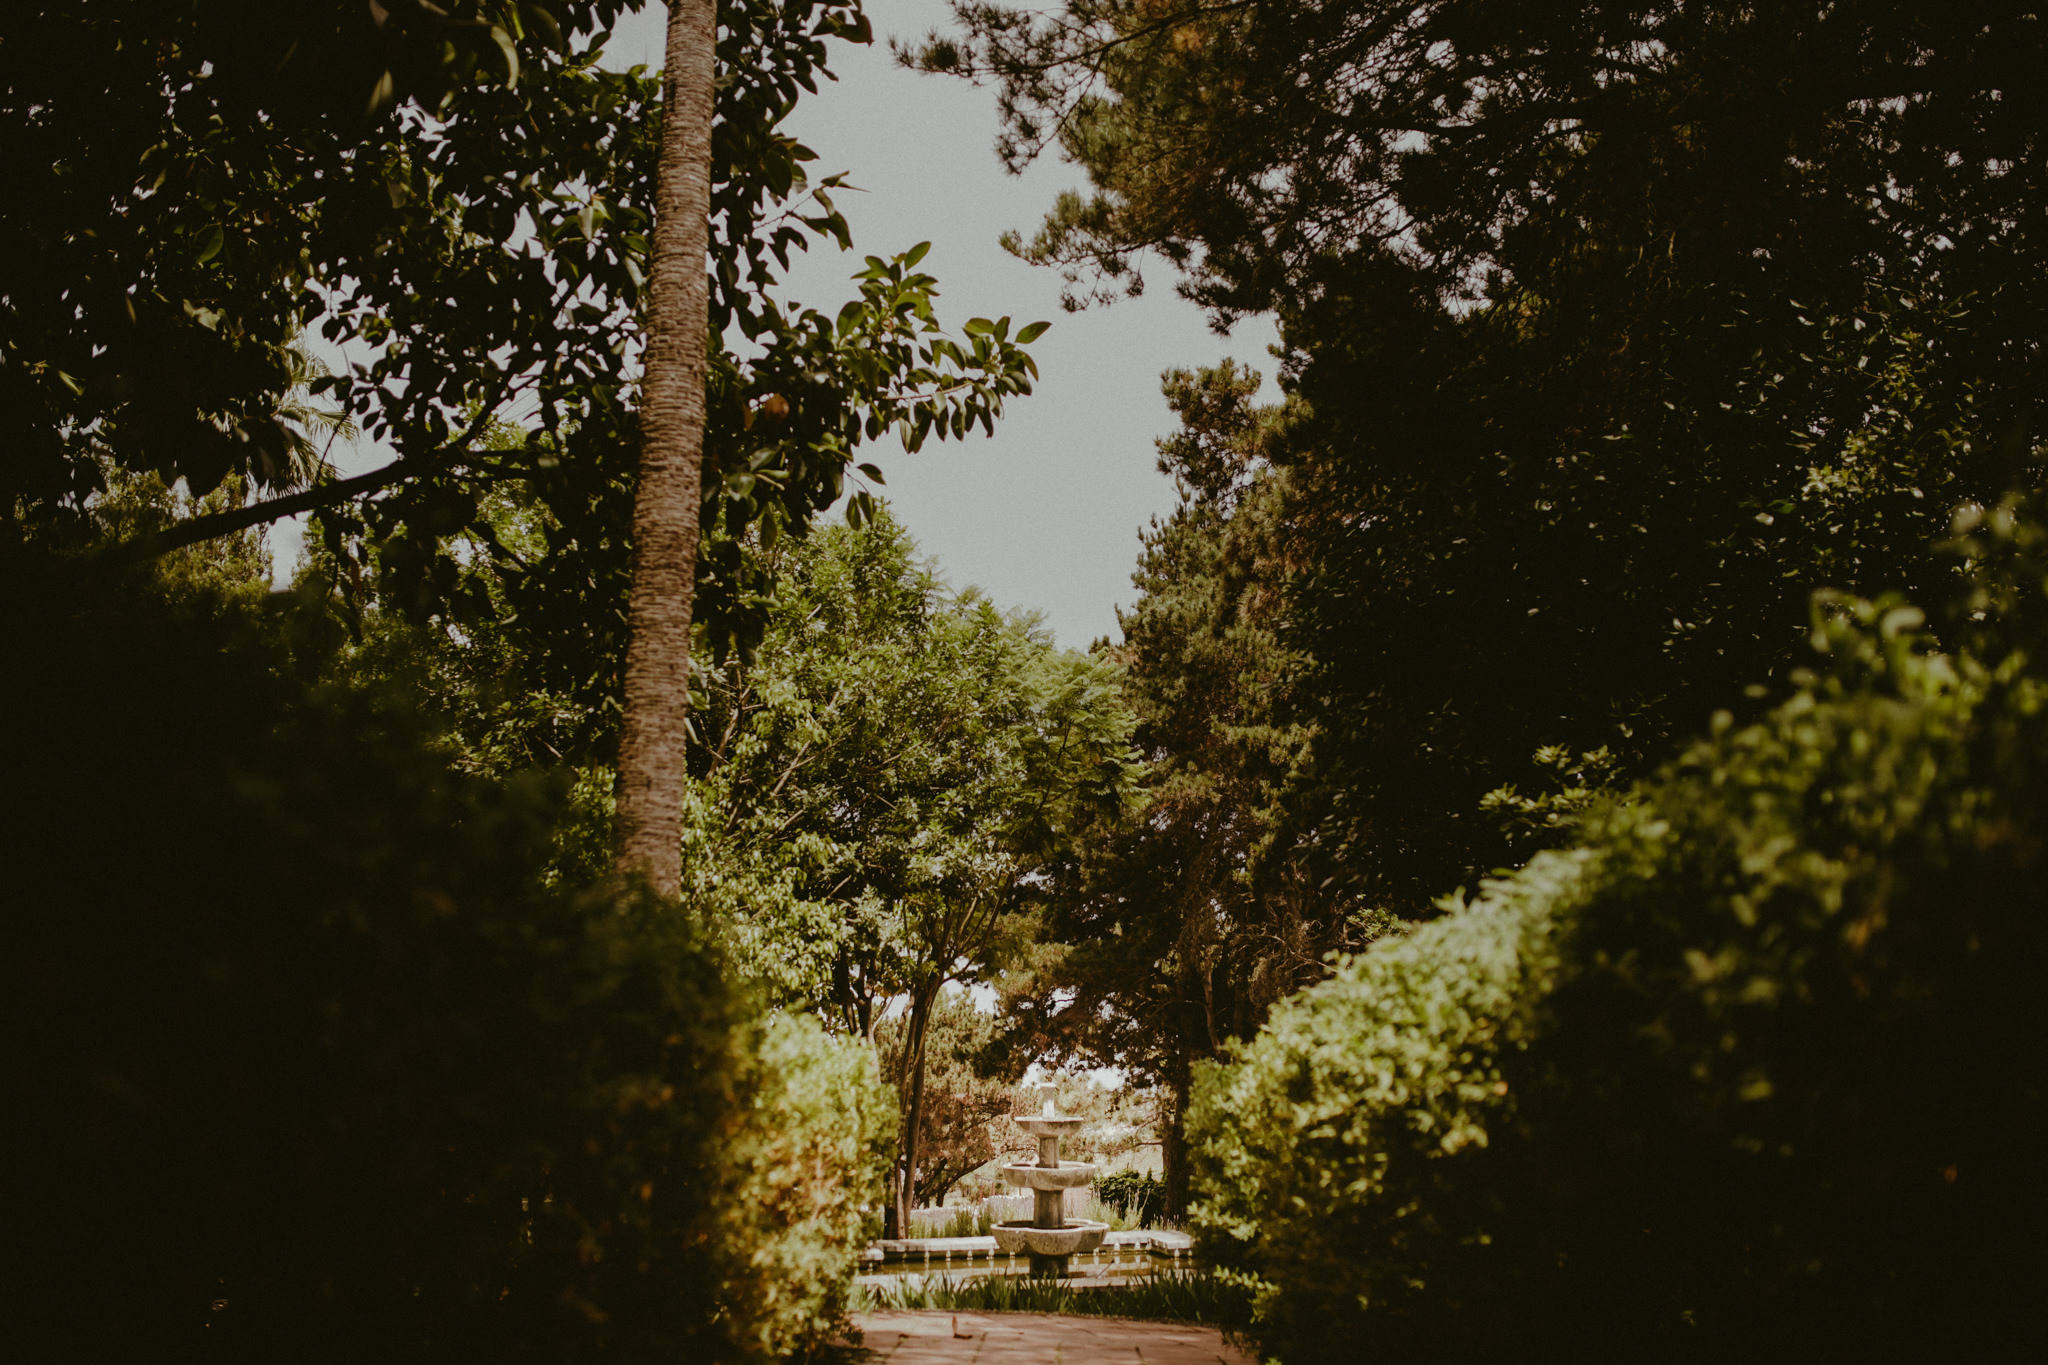 boda-diferente-fotografo-boda-laspalmas-grancanaria-11